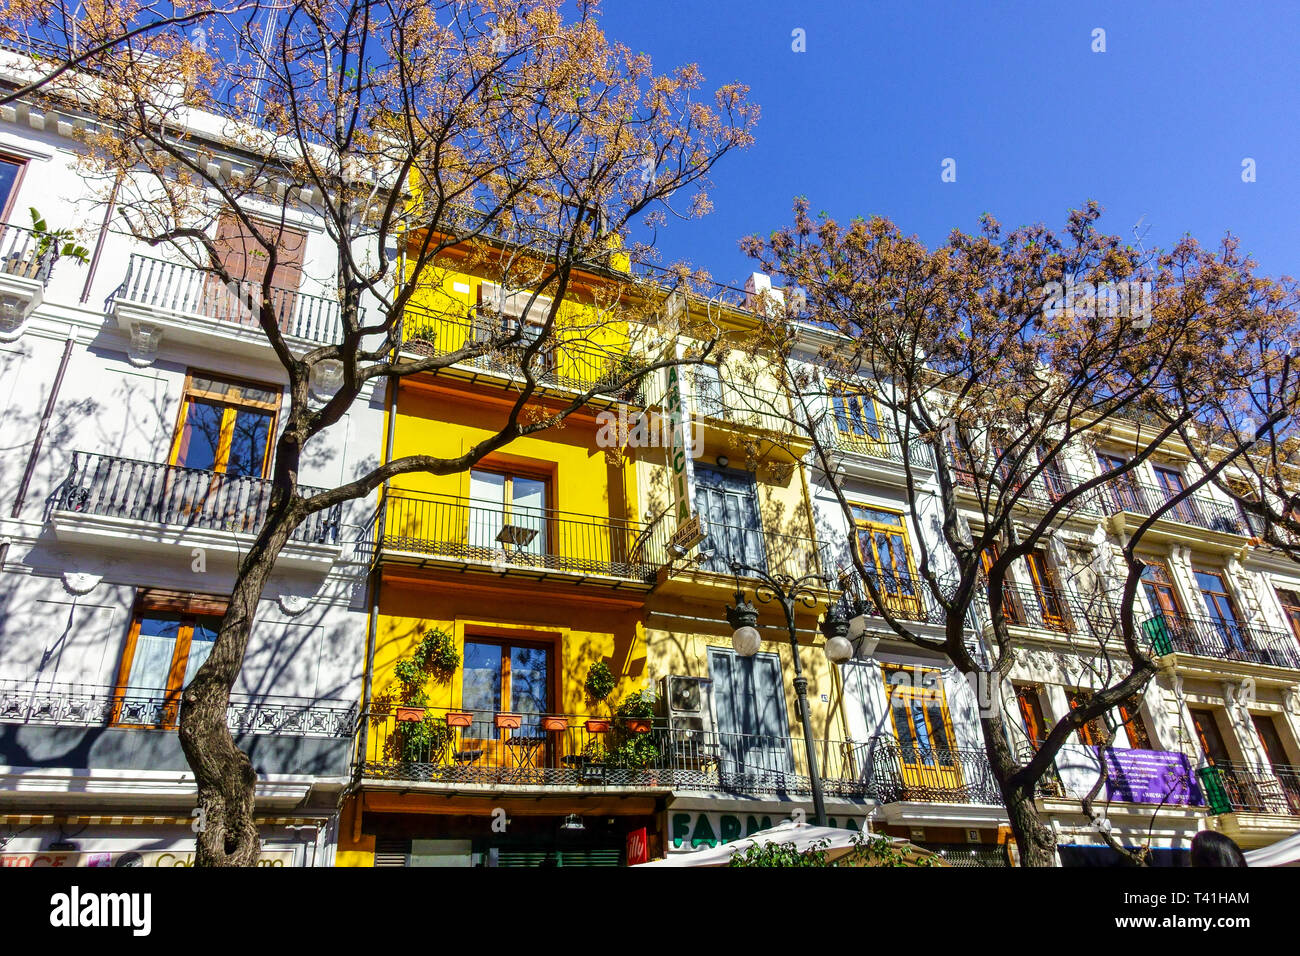 Colorful houses on Plaza de Mercat, Ciutat Vella Valencia apartment Spain Stock Photo